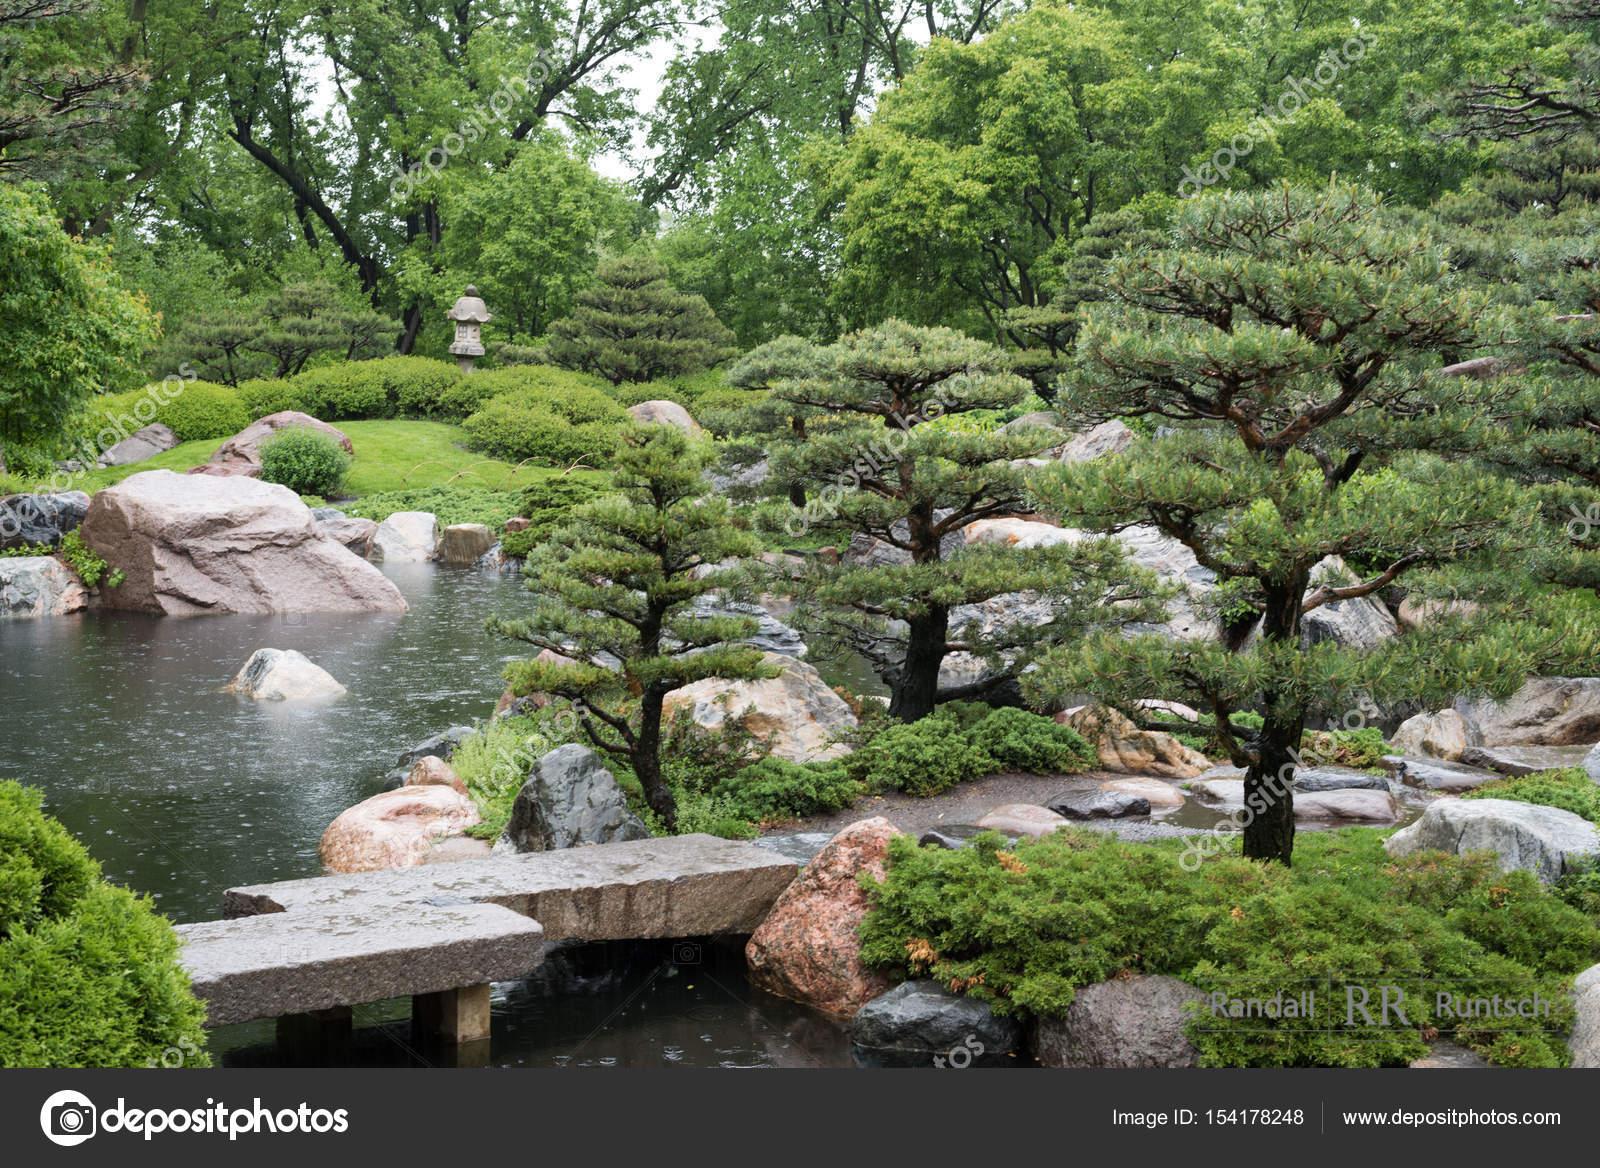 A Stone Bridge Crosses Pond In Japanaese Garden Photo By Rruntsch